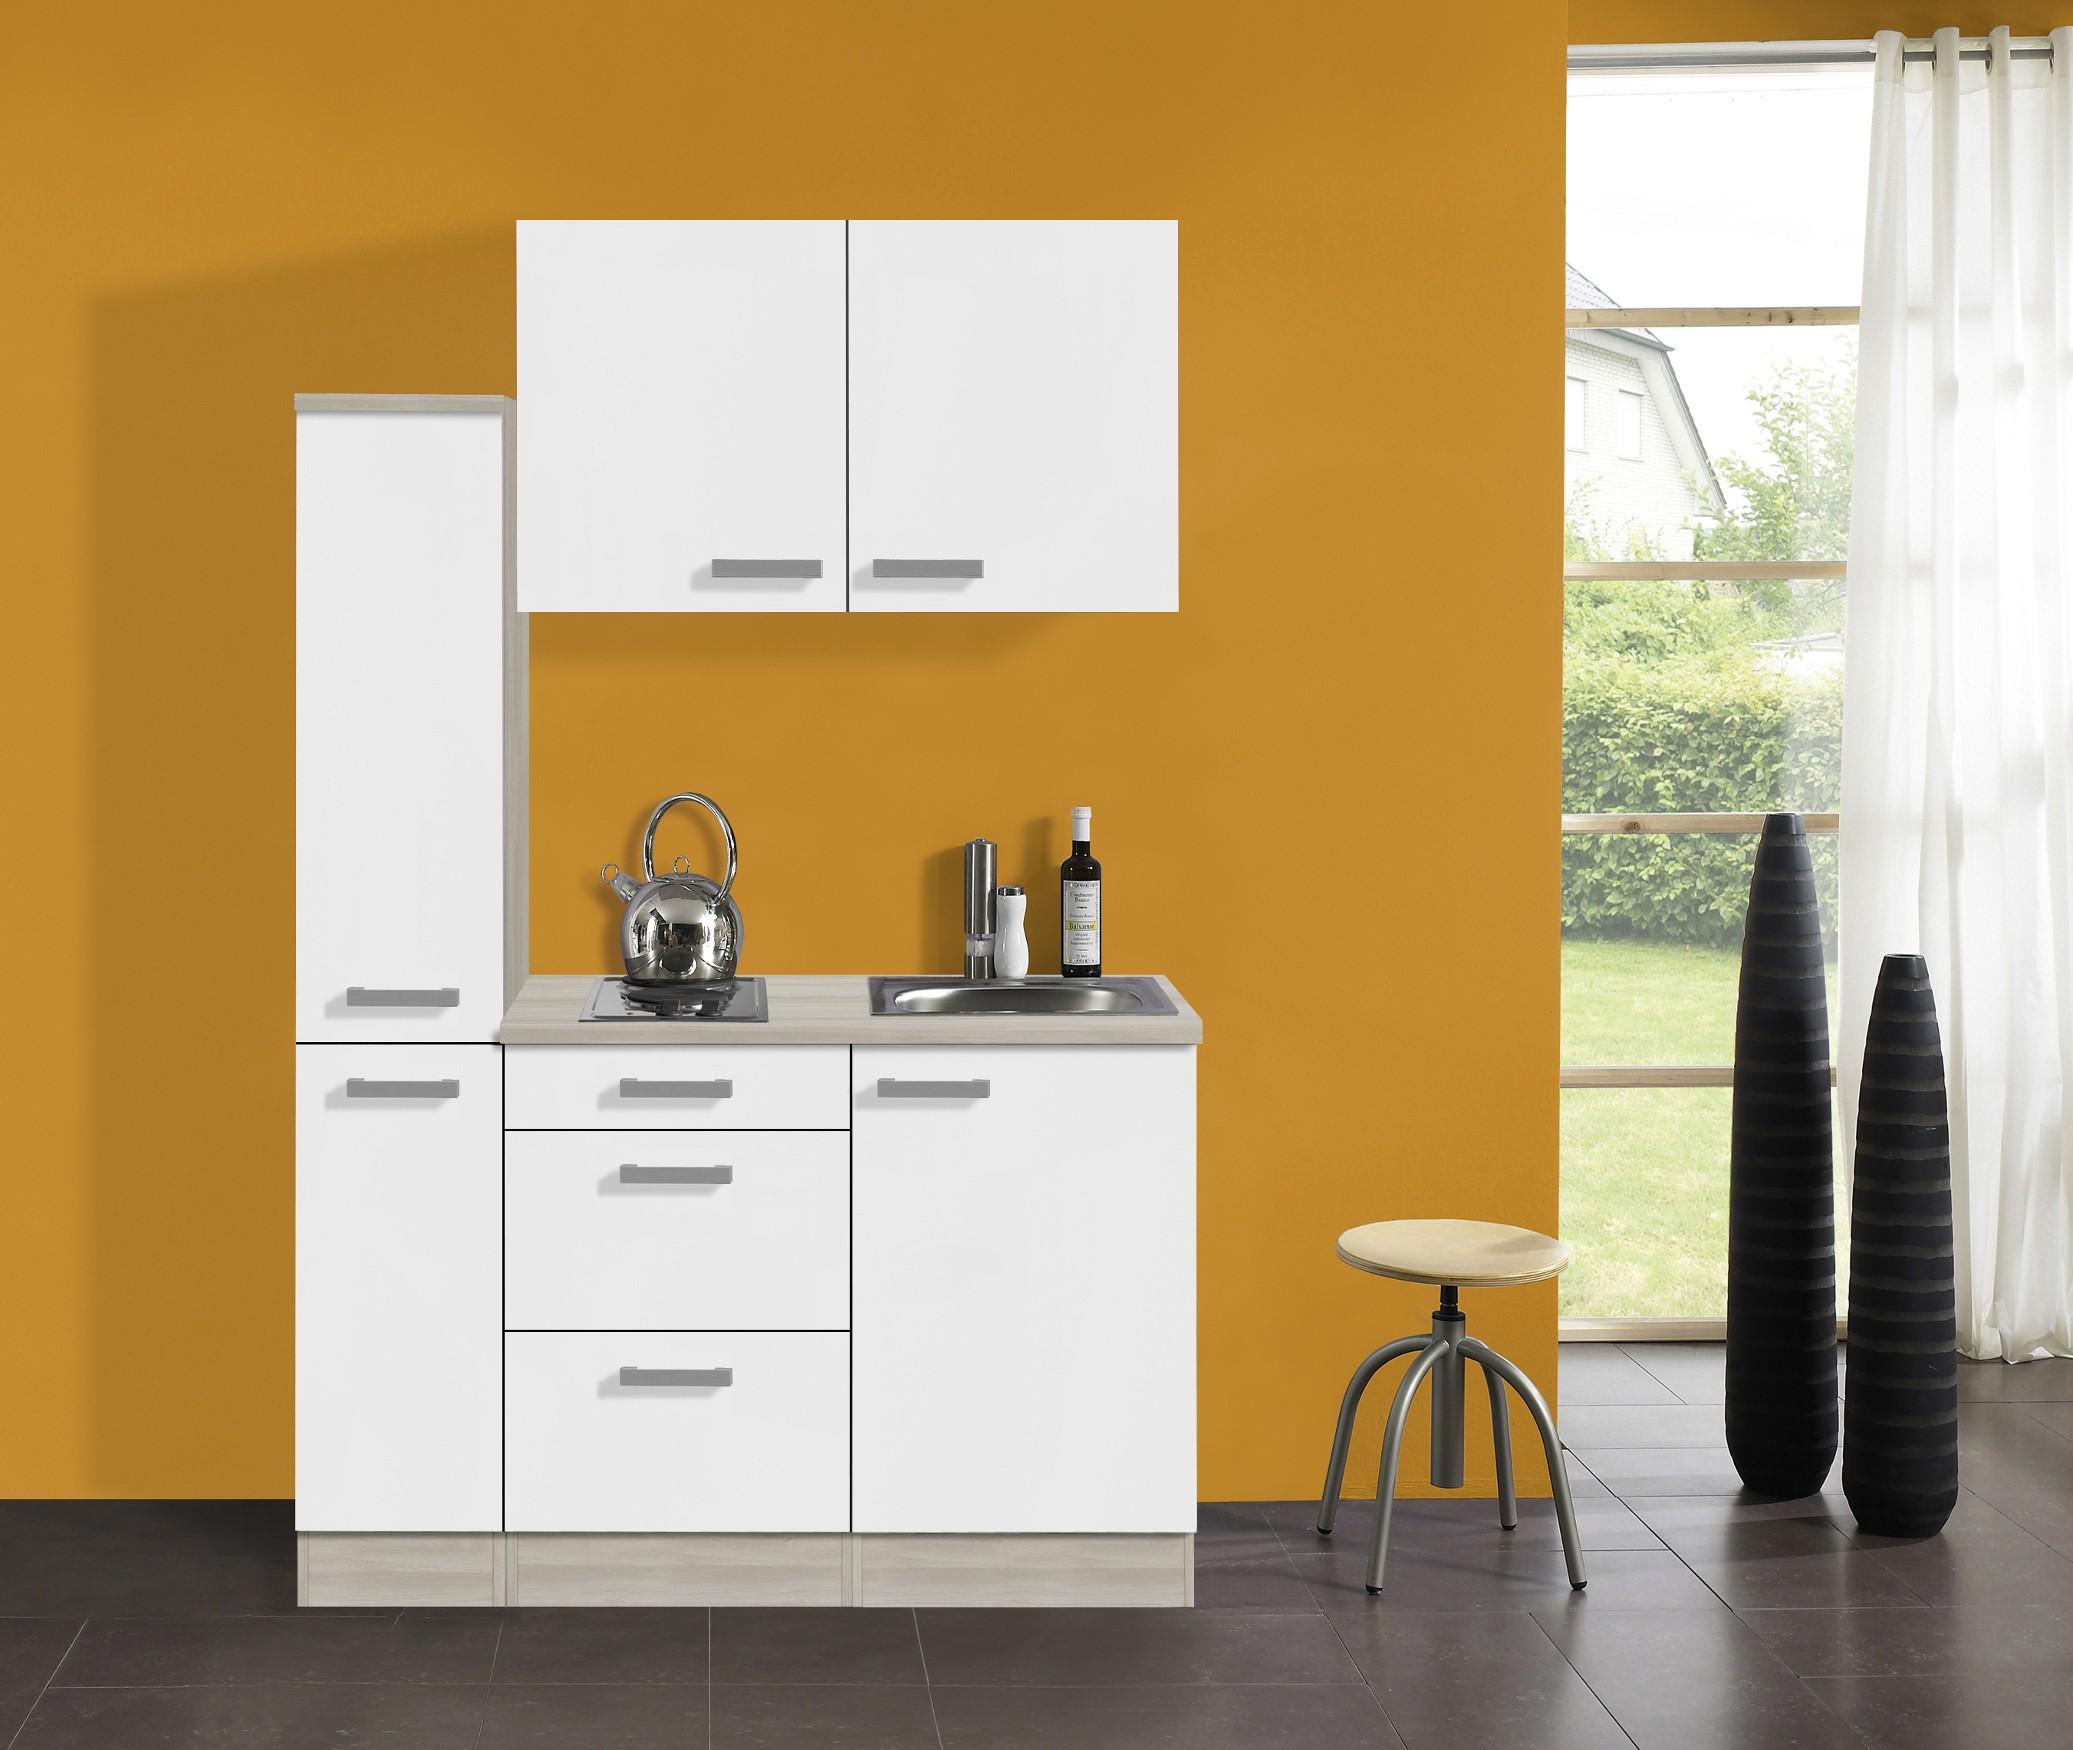 singlek che barcelona mit elektro kochfeld breite 130 cm wei k che singlek chen. Black Bedroom Furniture Sets. Home Design Ideas